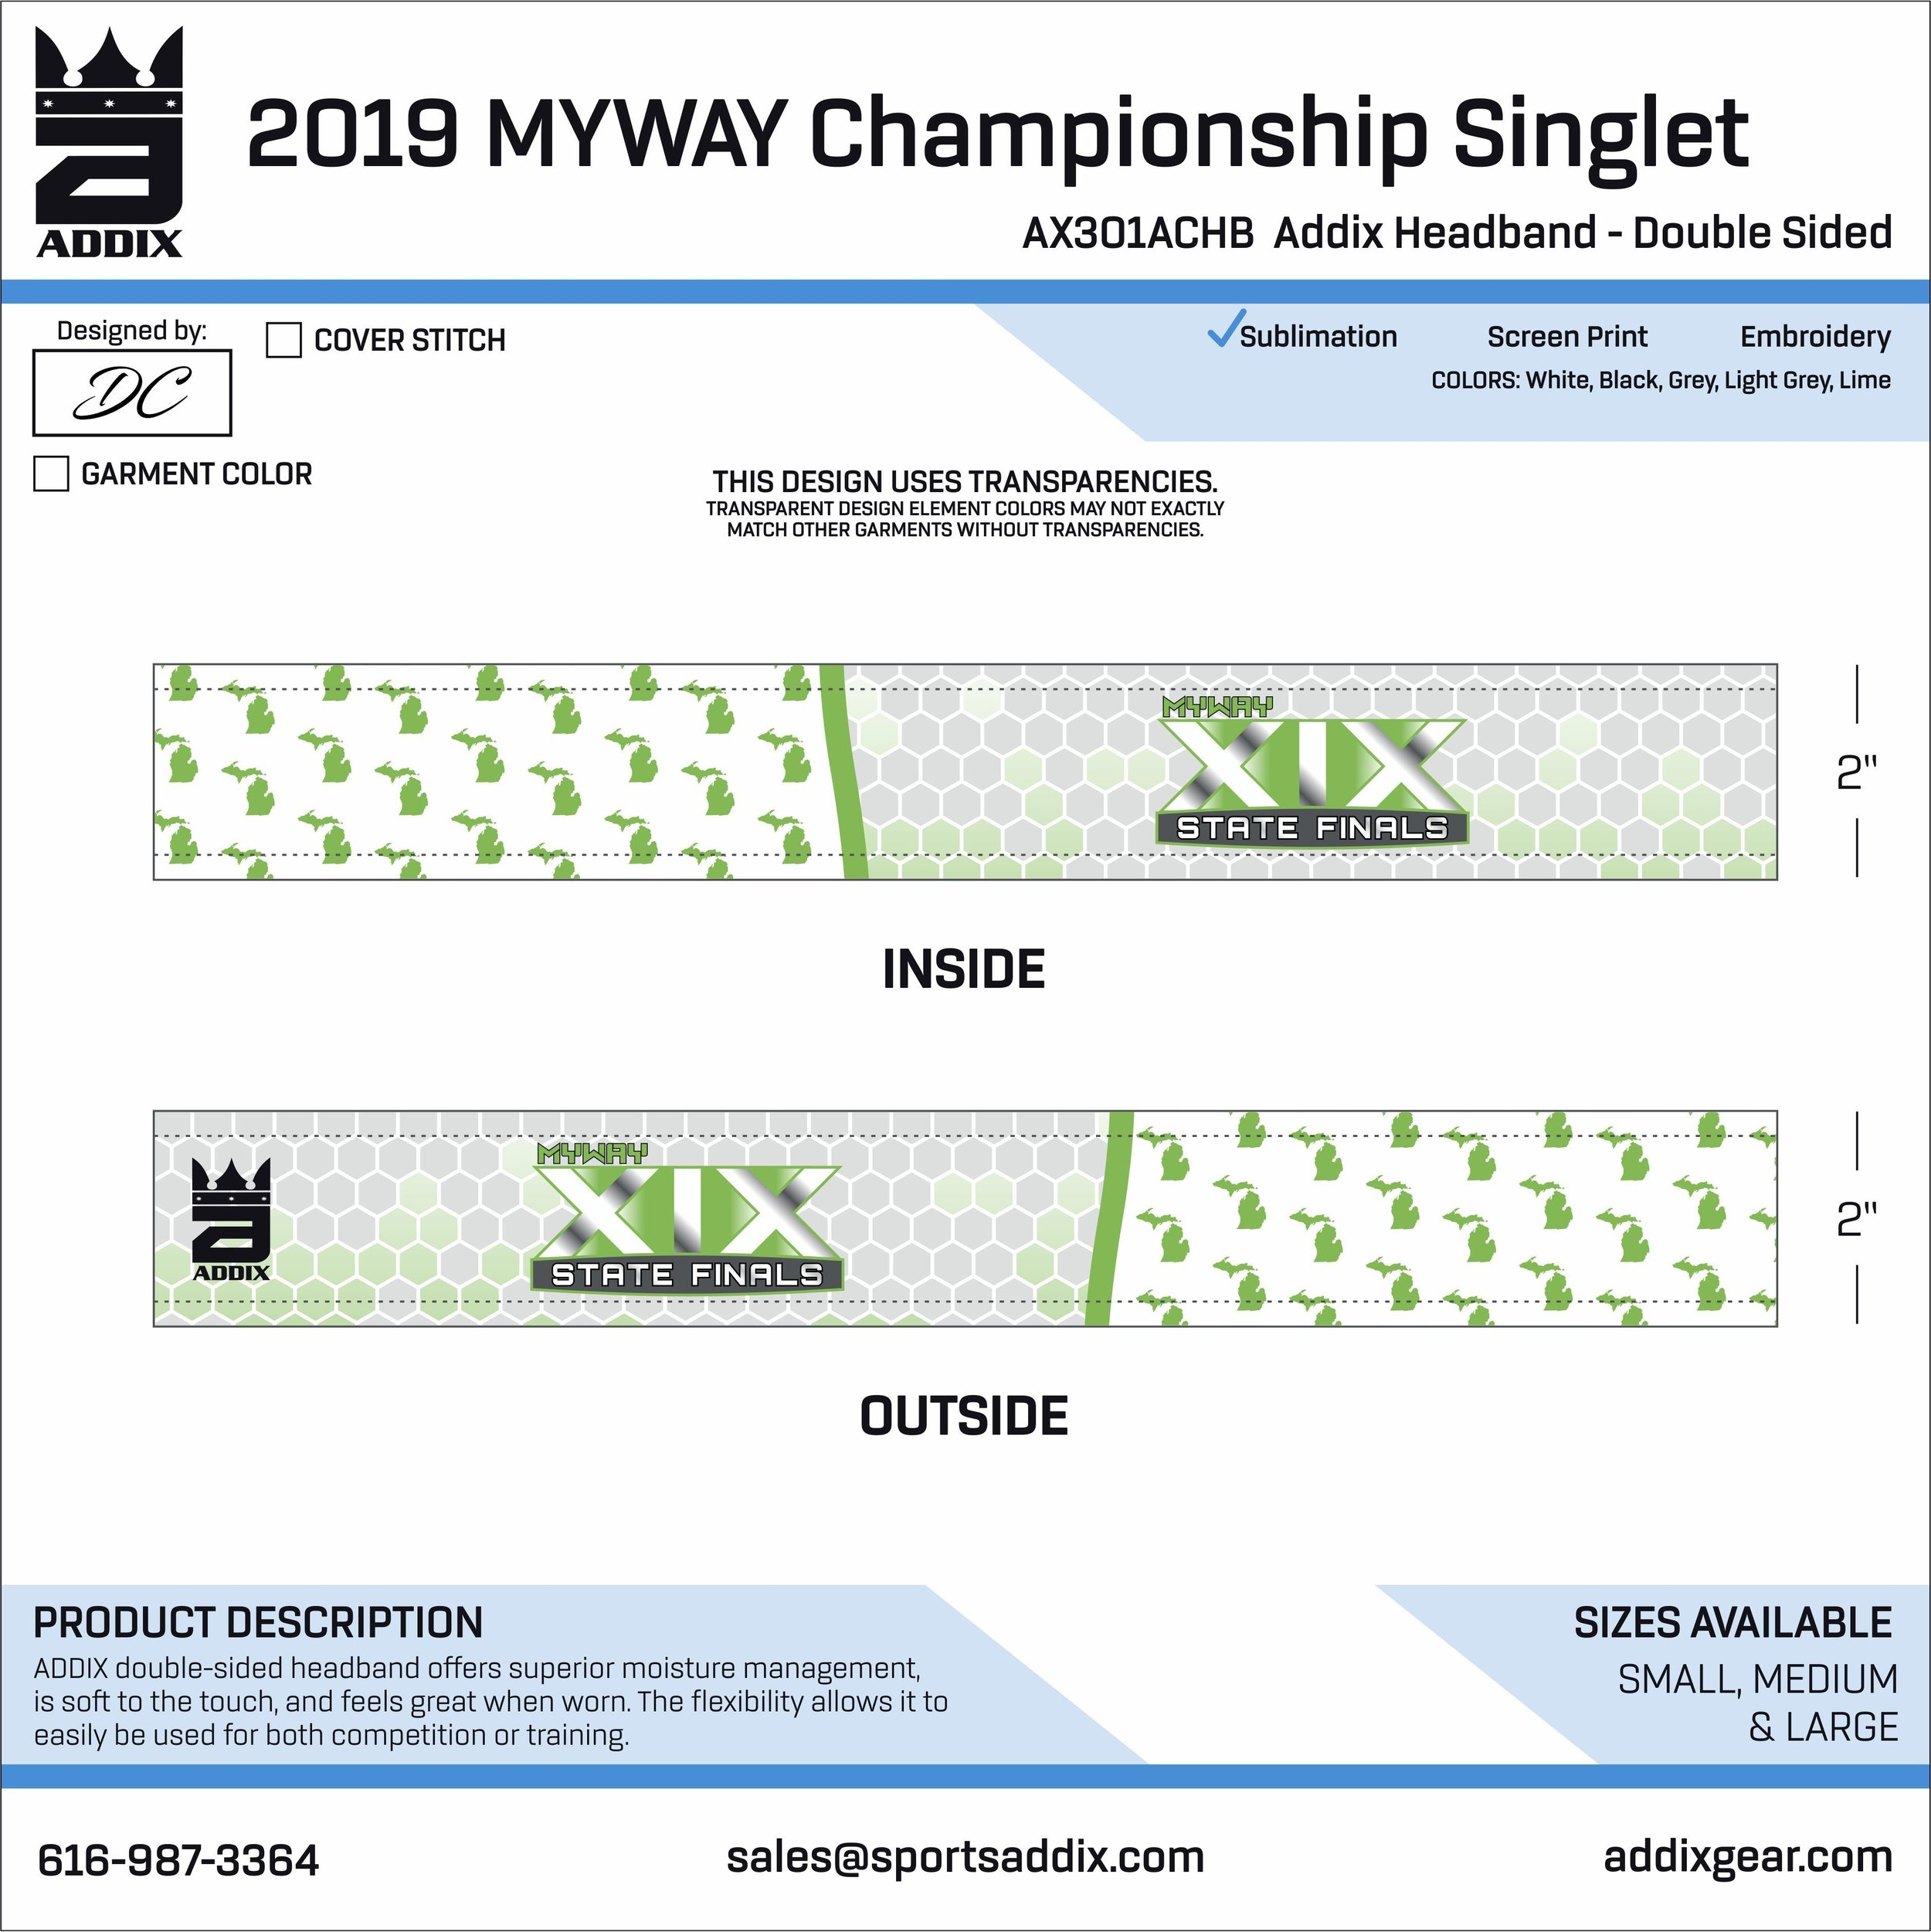 2019 MYWAY Championship Singlet_2019_2-13_DC_Headband.jpg